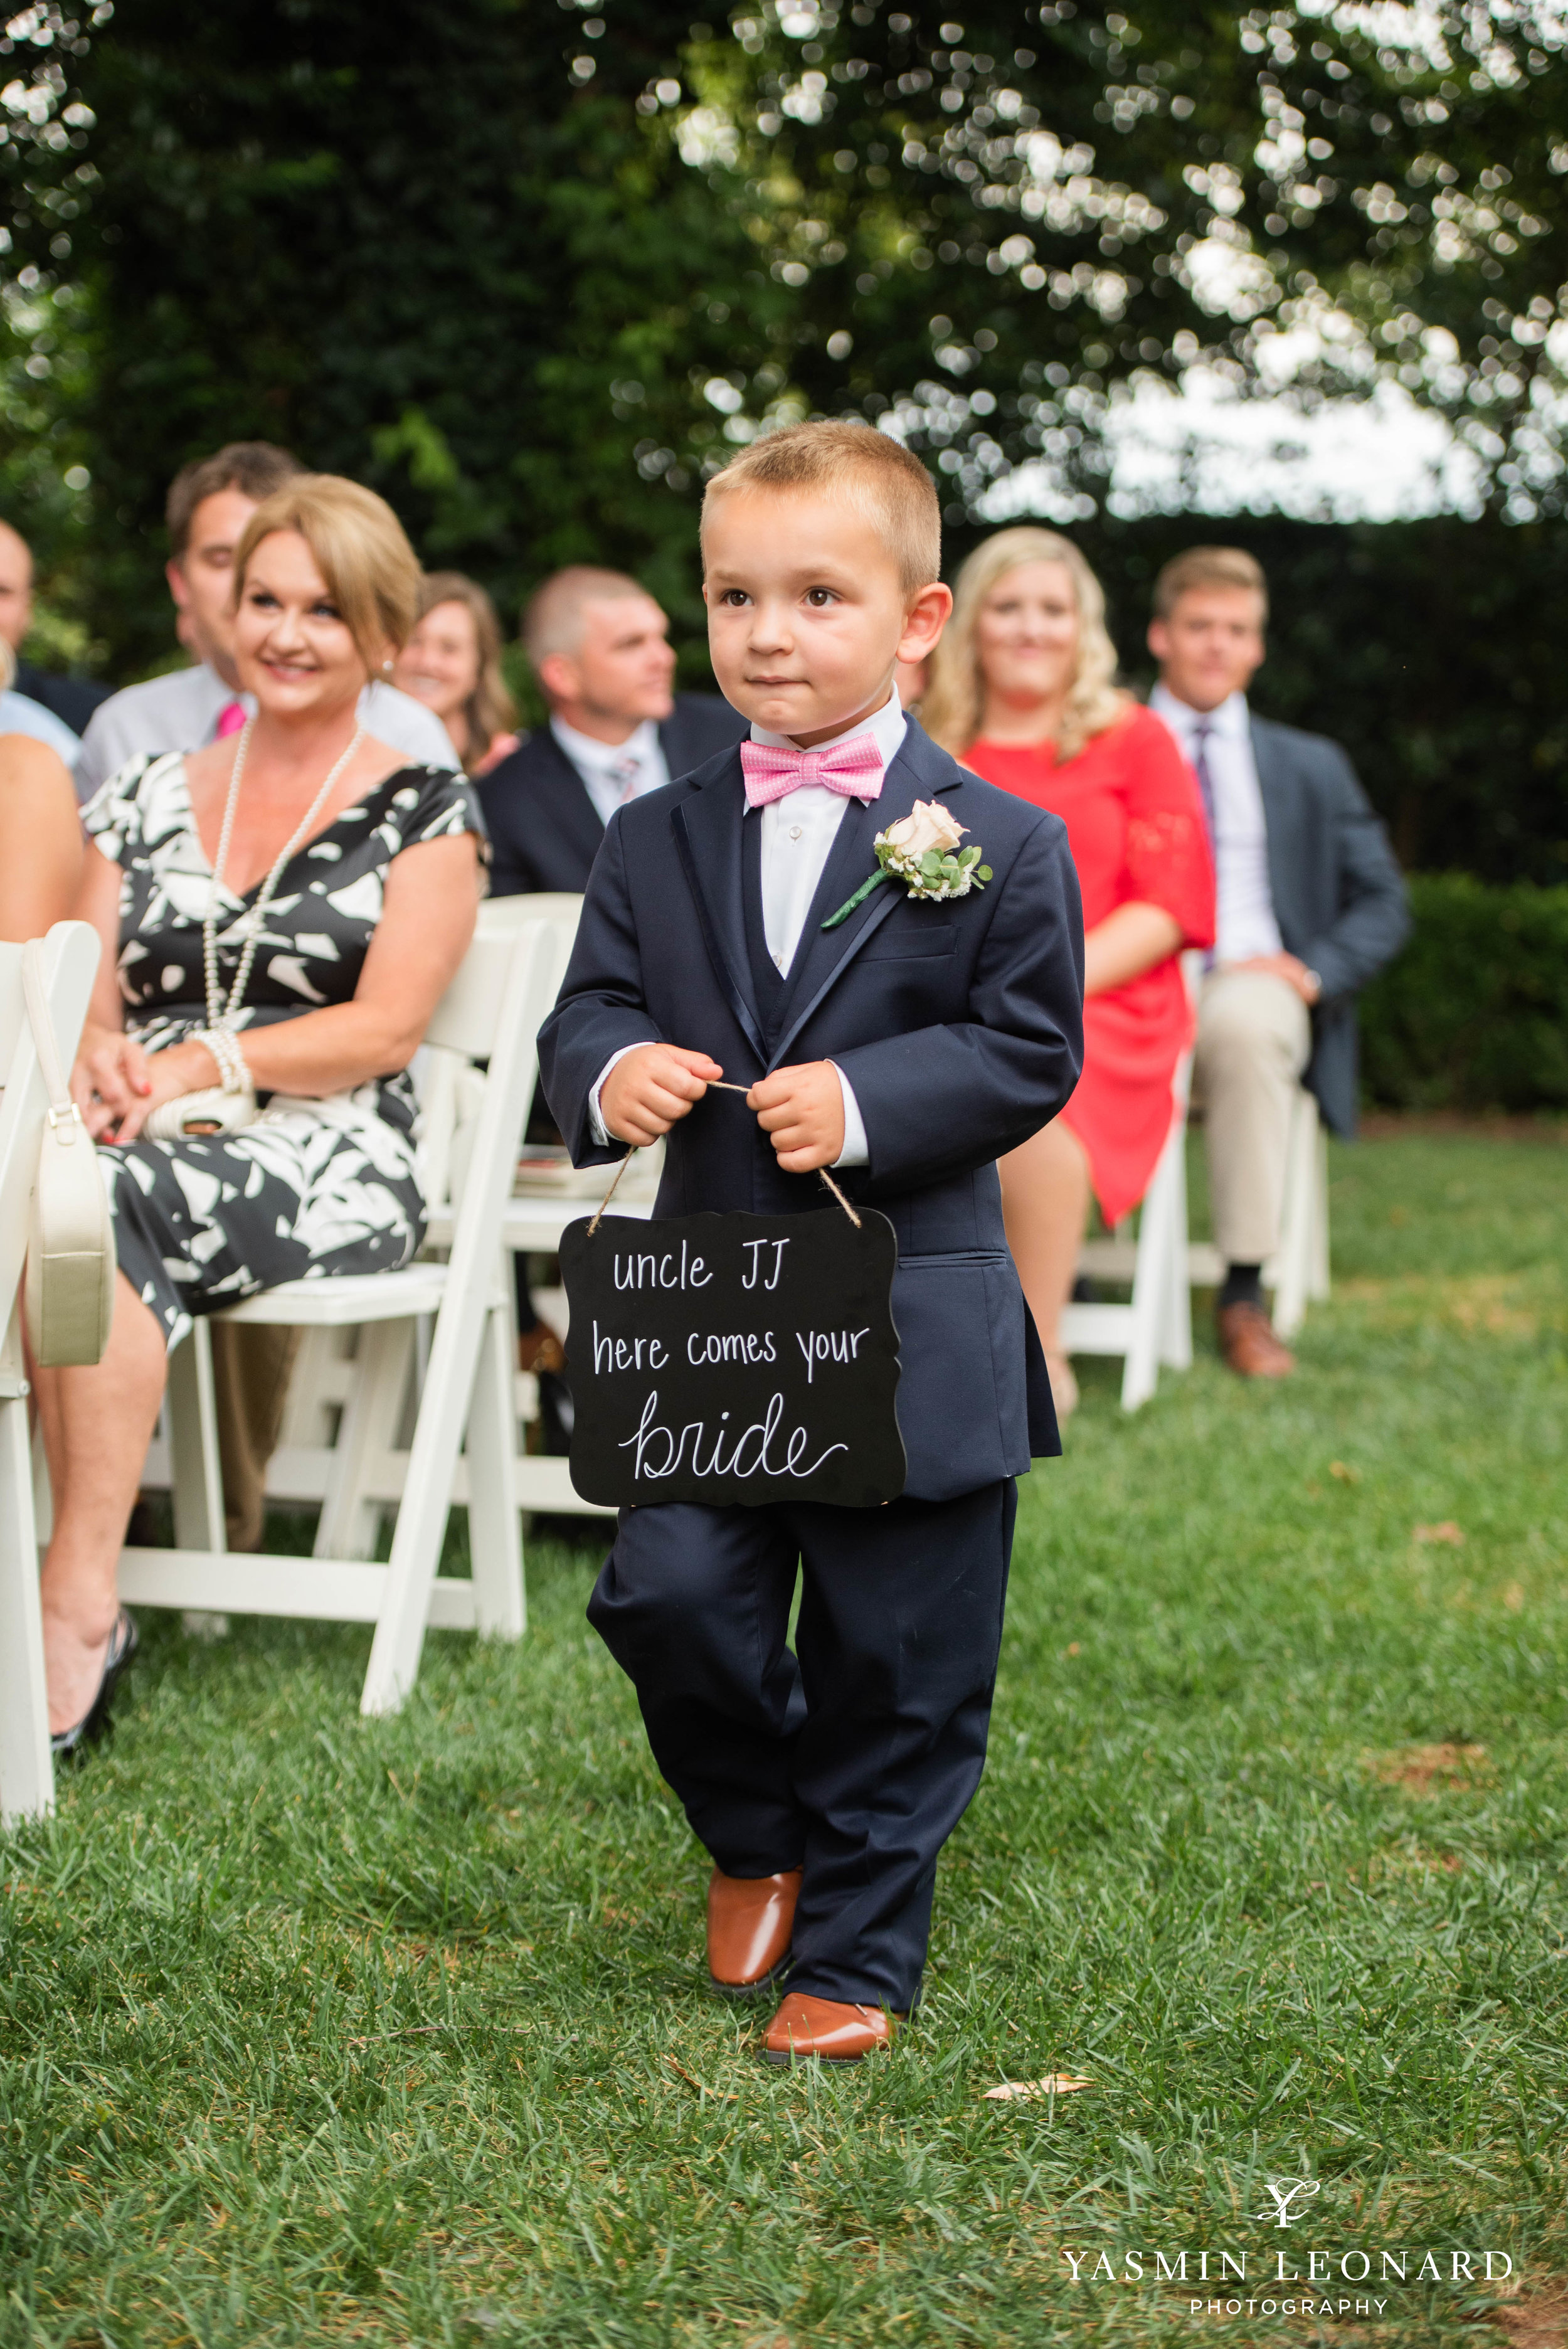 Separk Mansion - NC Weddings - Gastonia Wedding - NC Wedding Venues - Pink and Blue Wedding Ideas - Pink Bridesmaid Dresses - Yasmin Leonard Photography-17.jpg